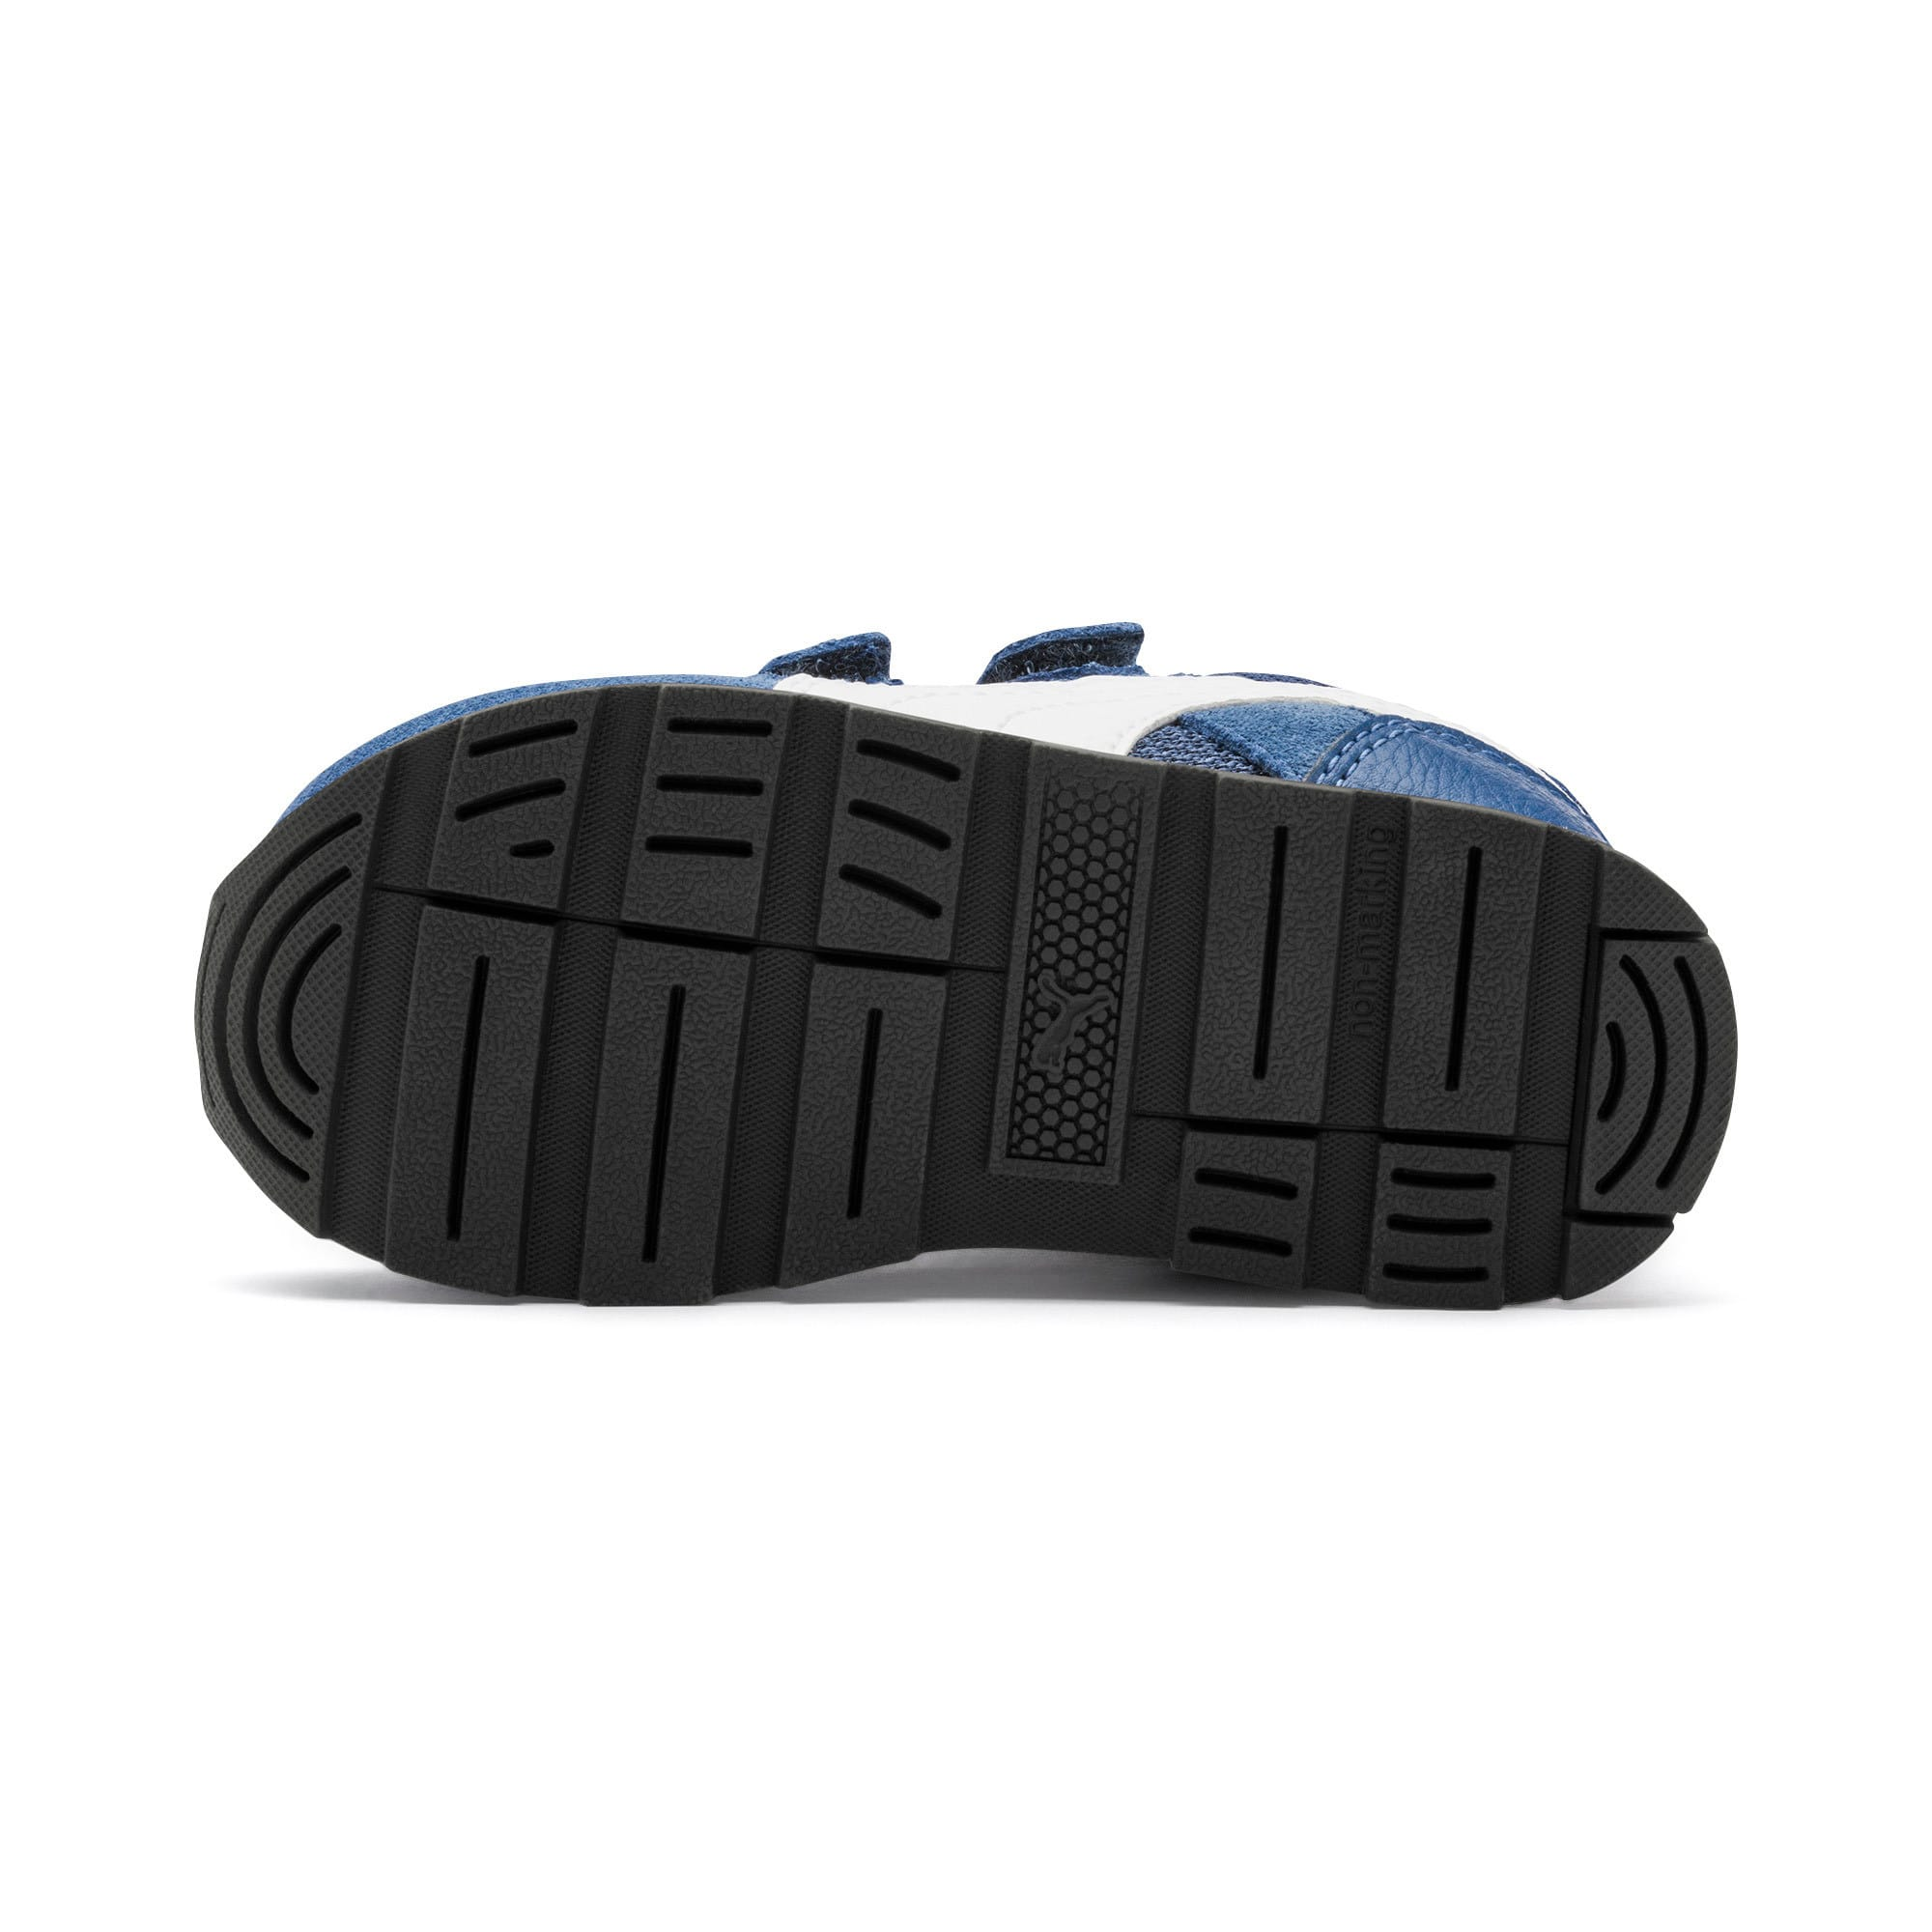 Thumbnail 4 of Vista Toddler Shoes, Galaxy Blue-Puma White, medium